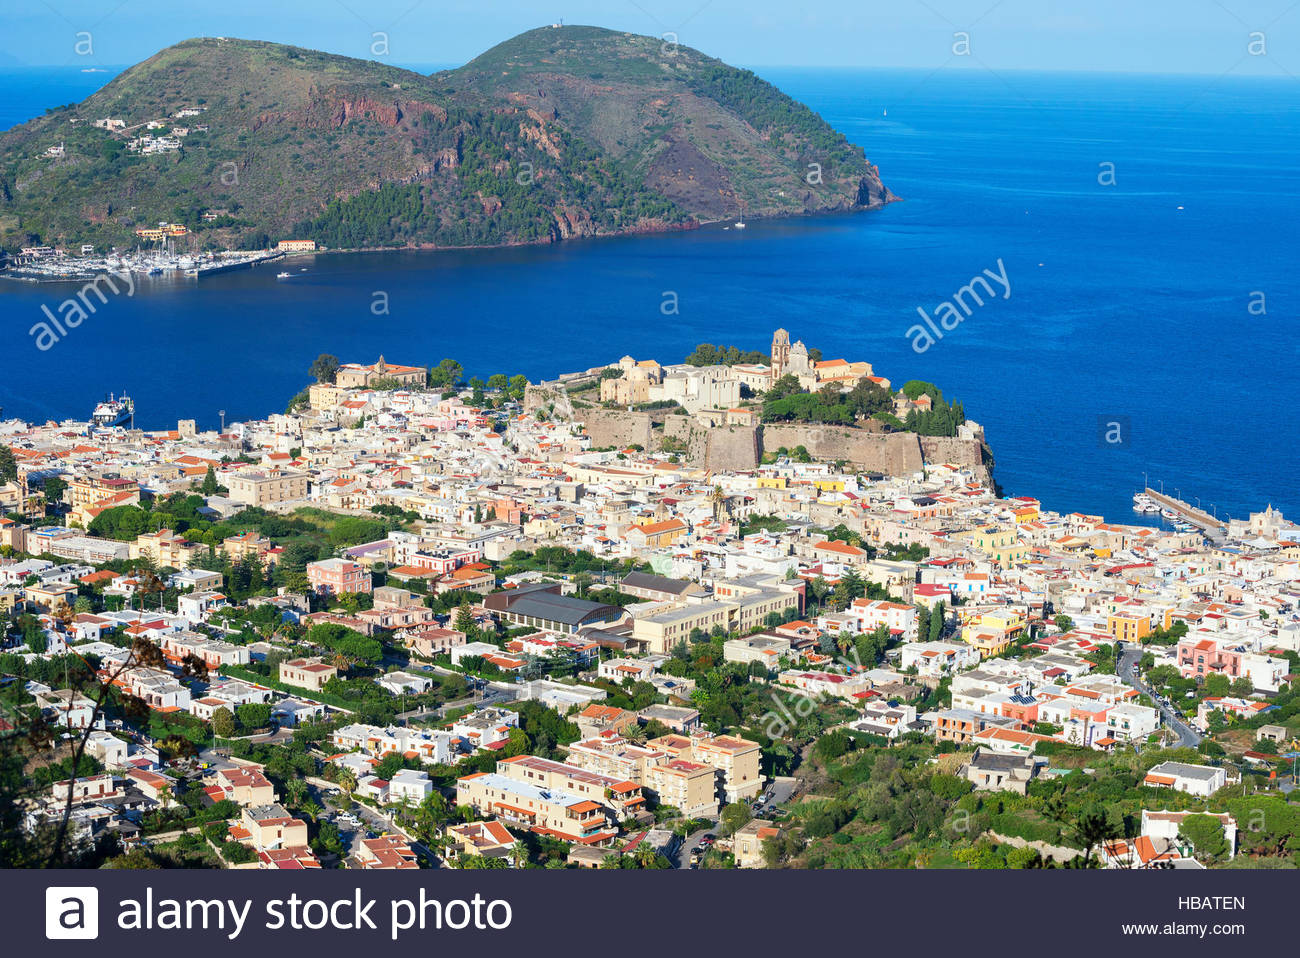 Vue de la ville de Lipari, Sicile, Italie Photo Stock